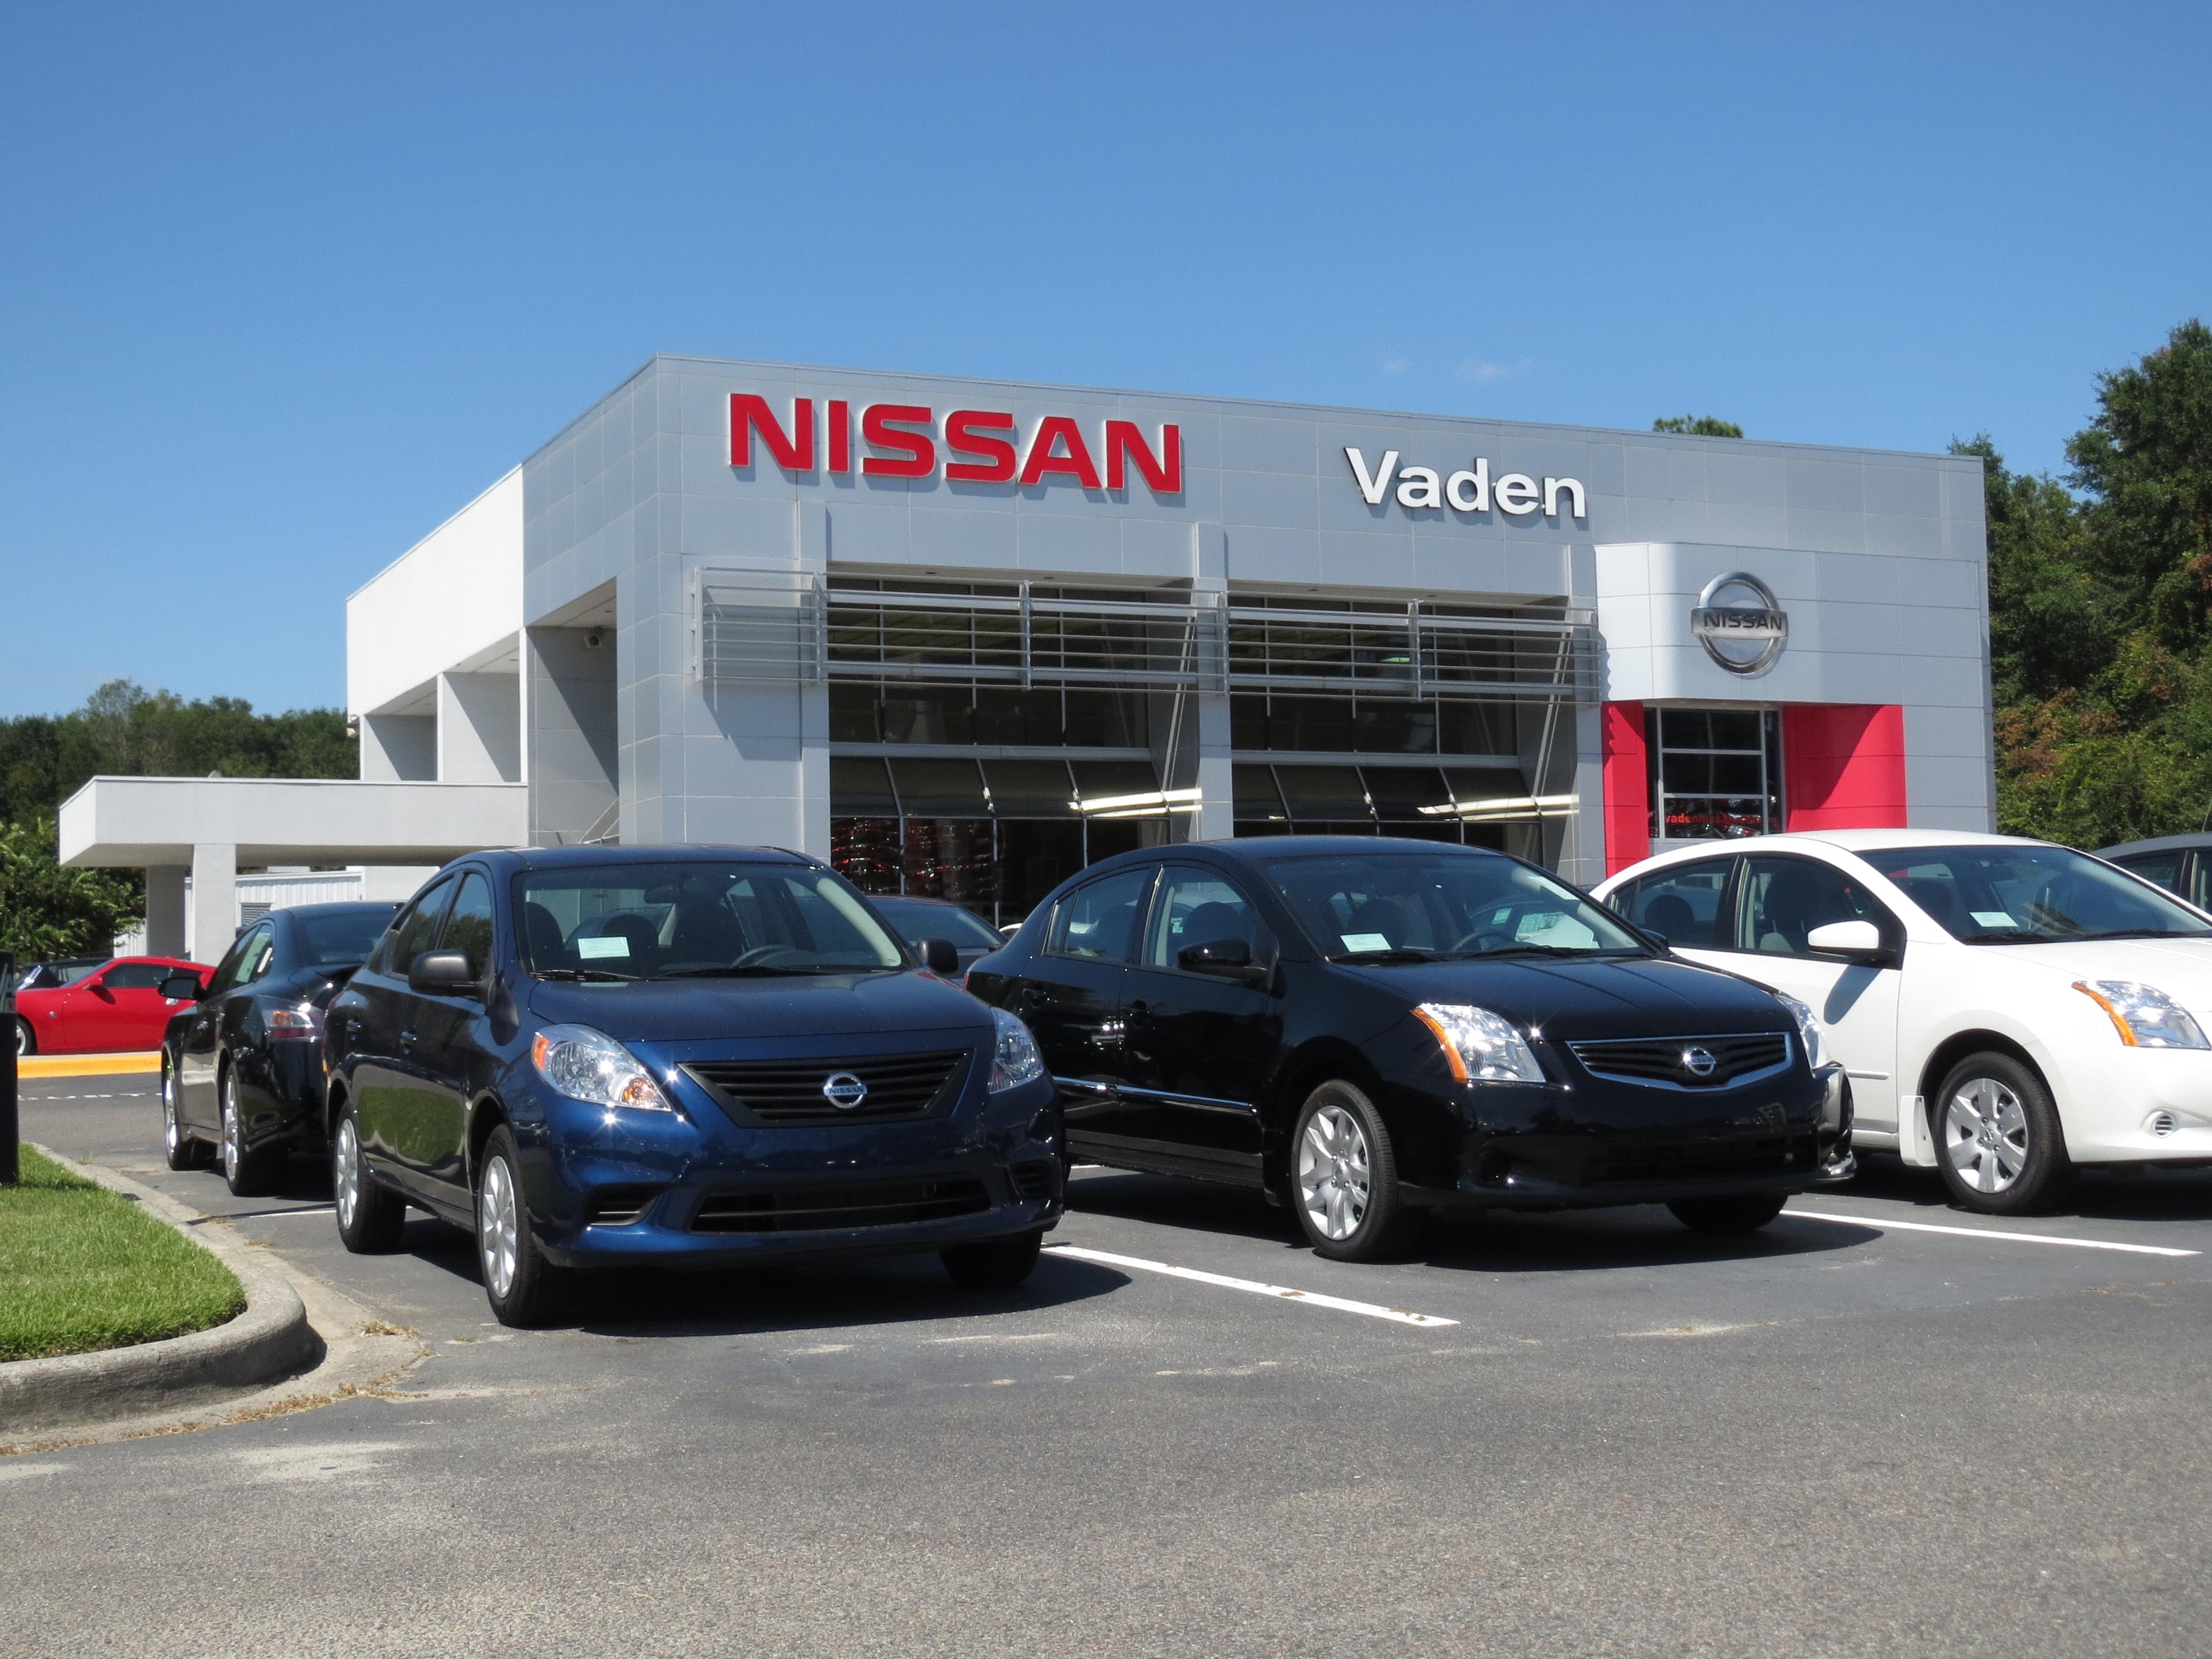 Nissan Used Cars Savannah Ga >> Vaden Nissan of Savannah in Savannah, GA 31419 ...